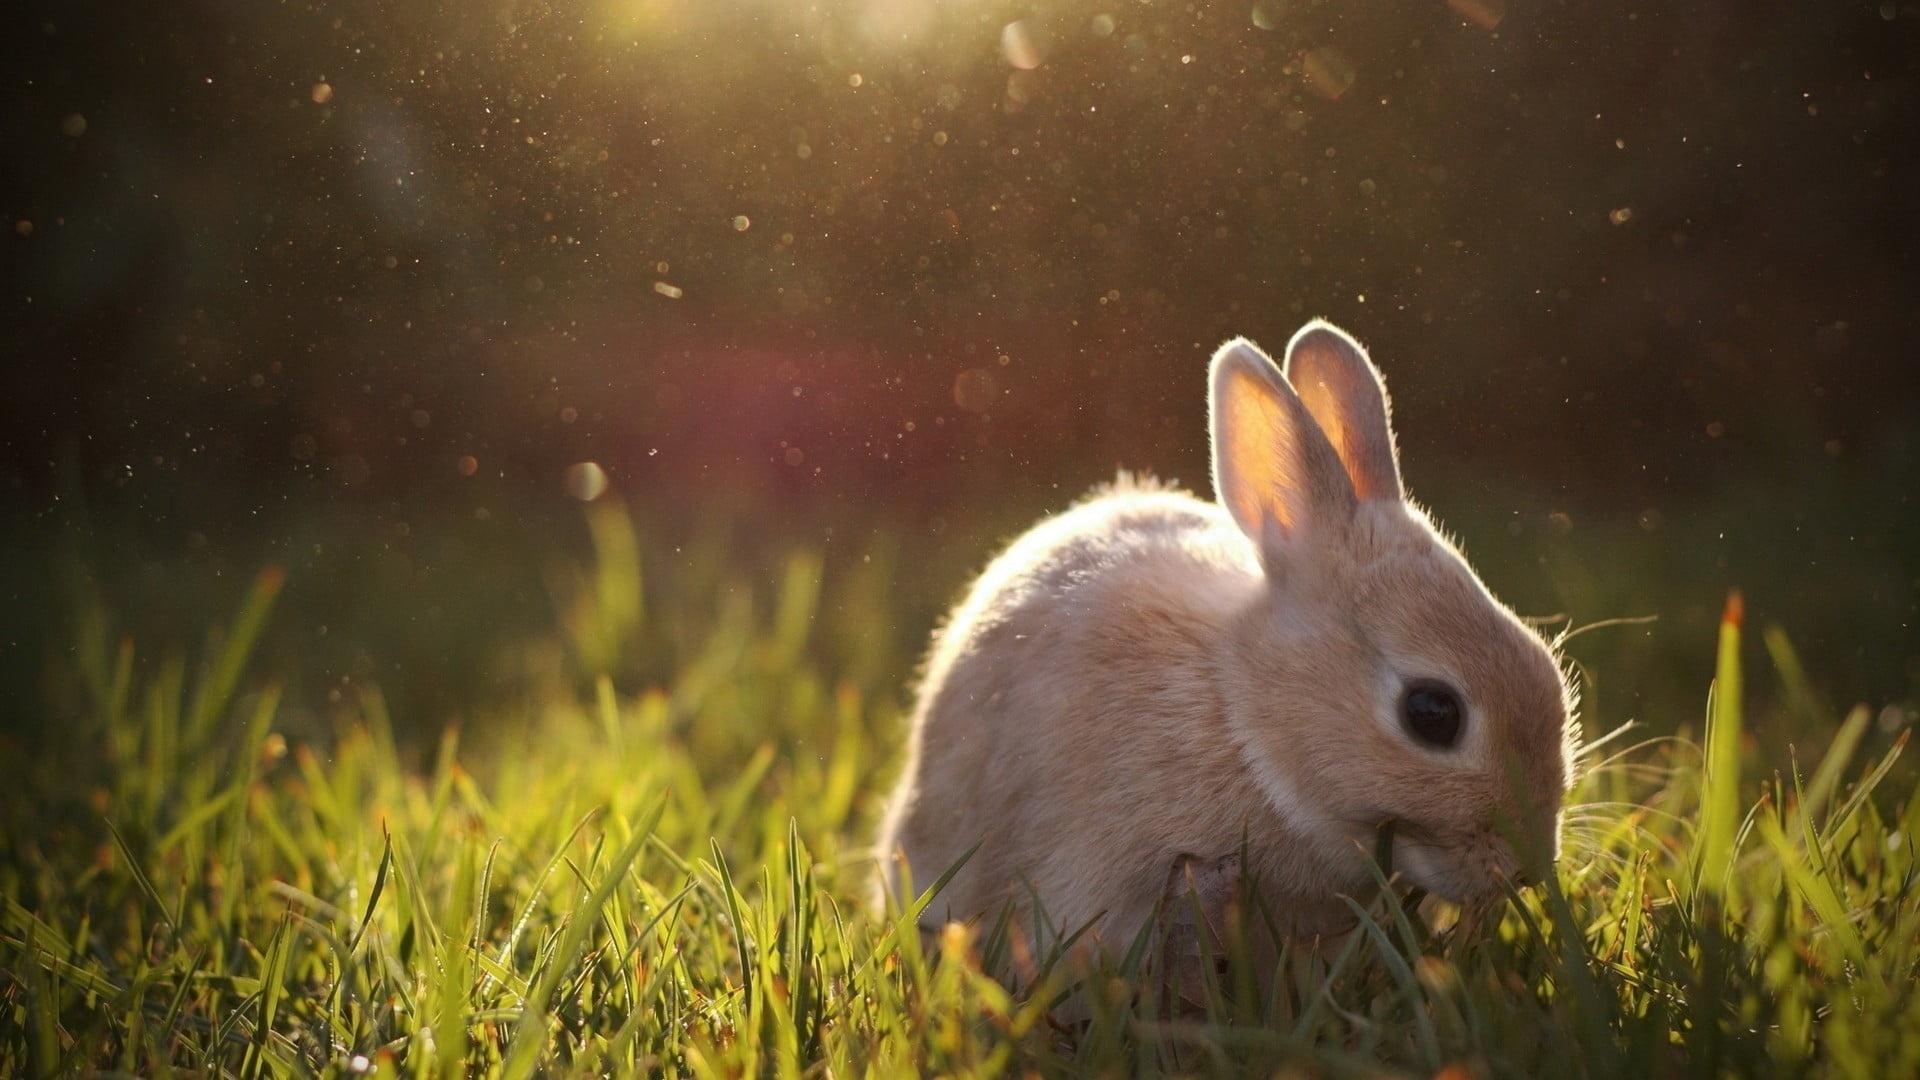 Cute Rabbit wallpaper for pc